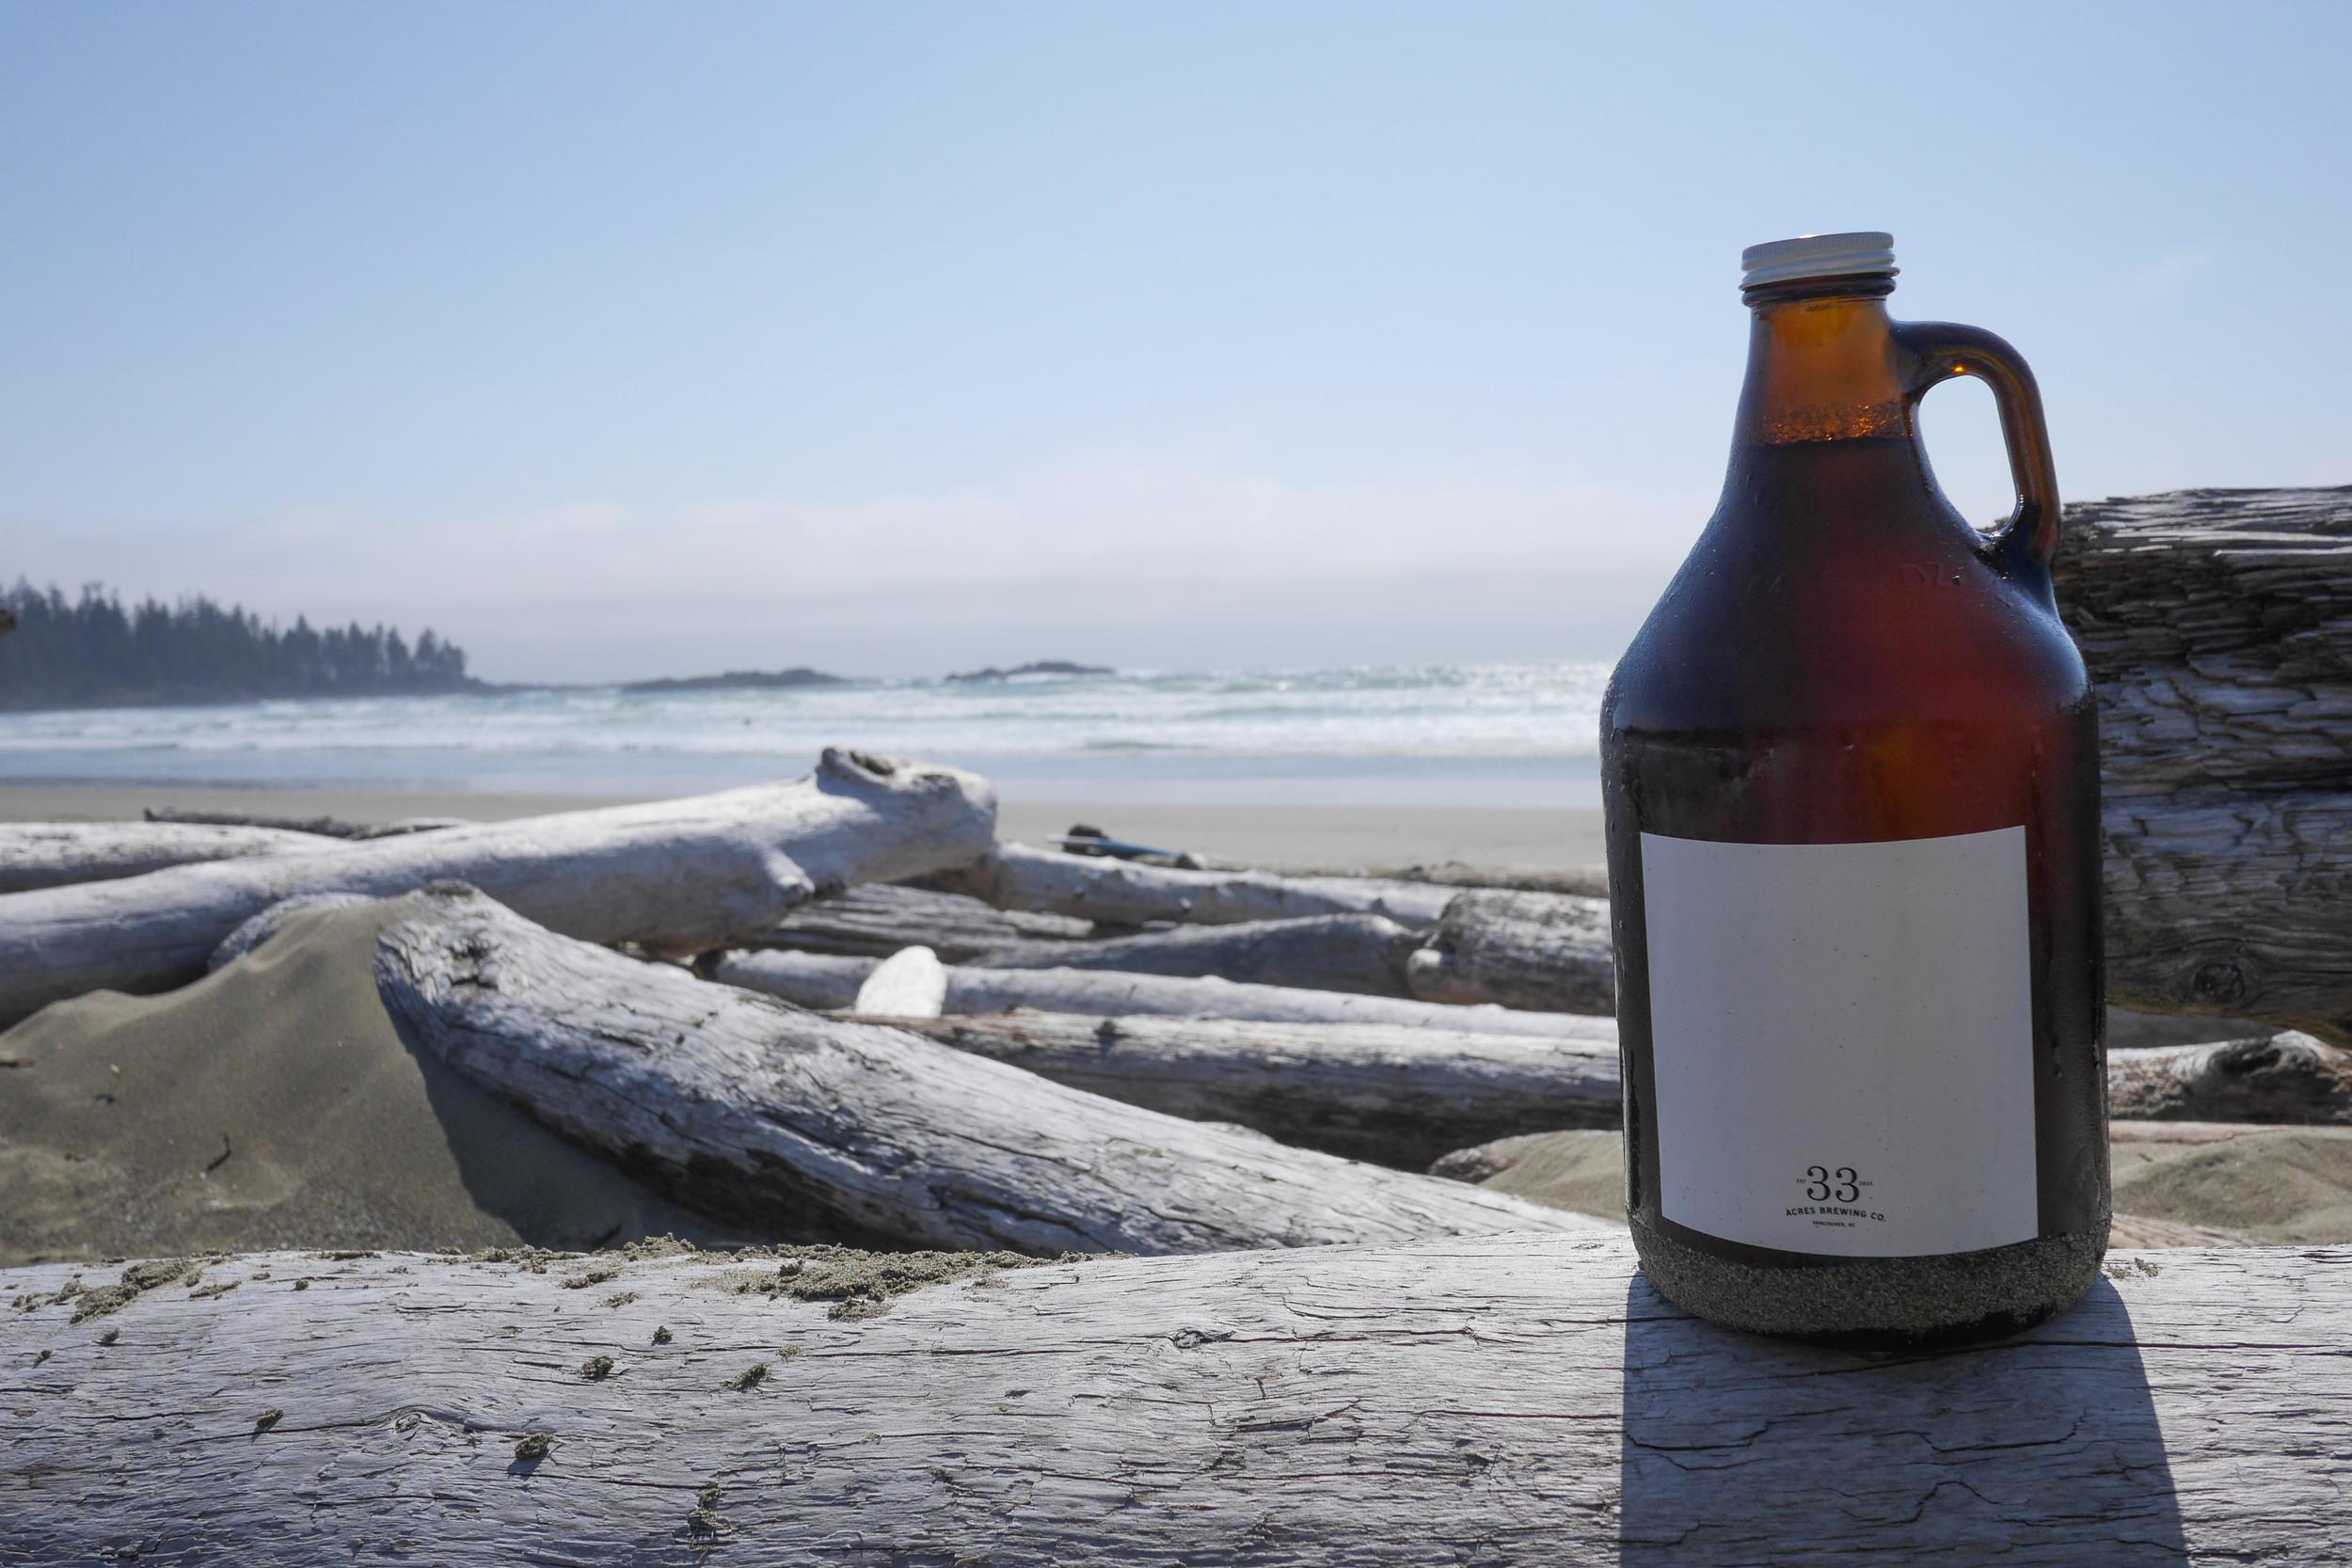 33 acres tofino beach life long beach weekend guide hello getaway